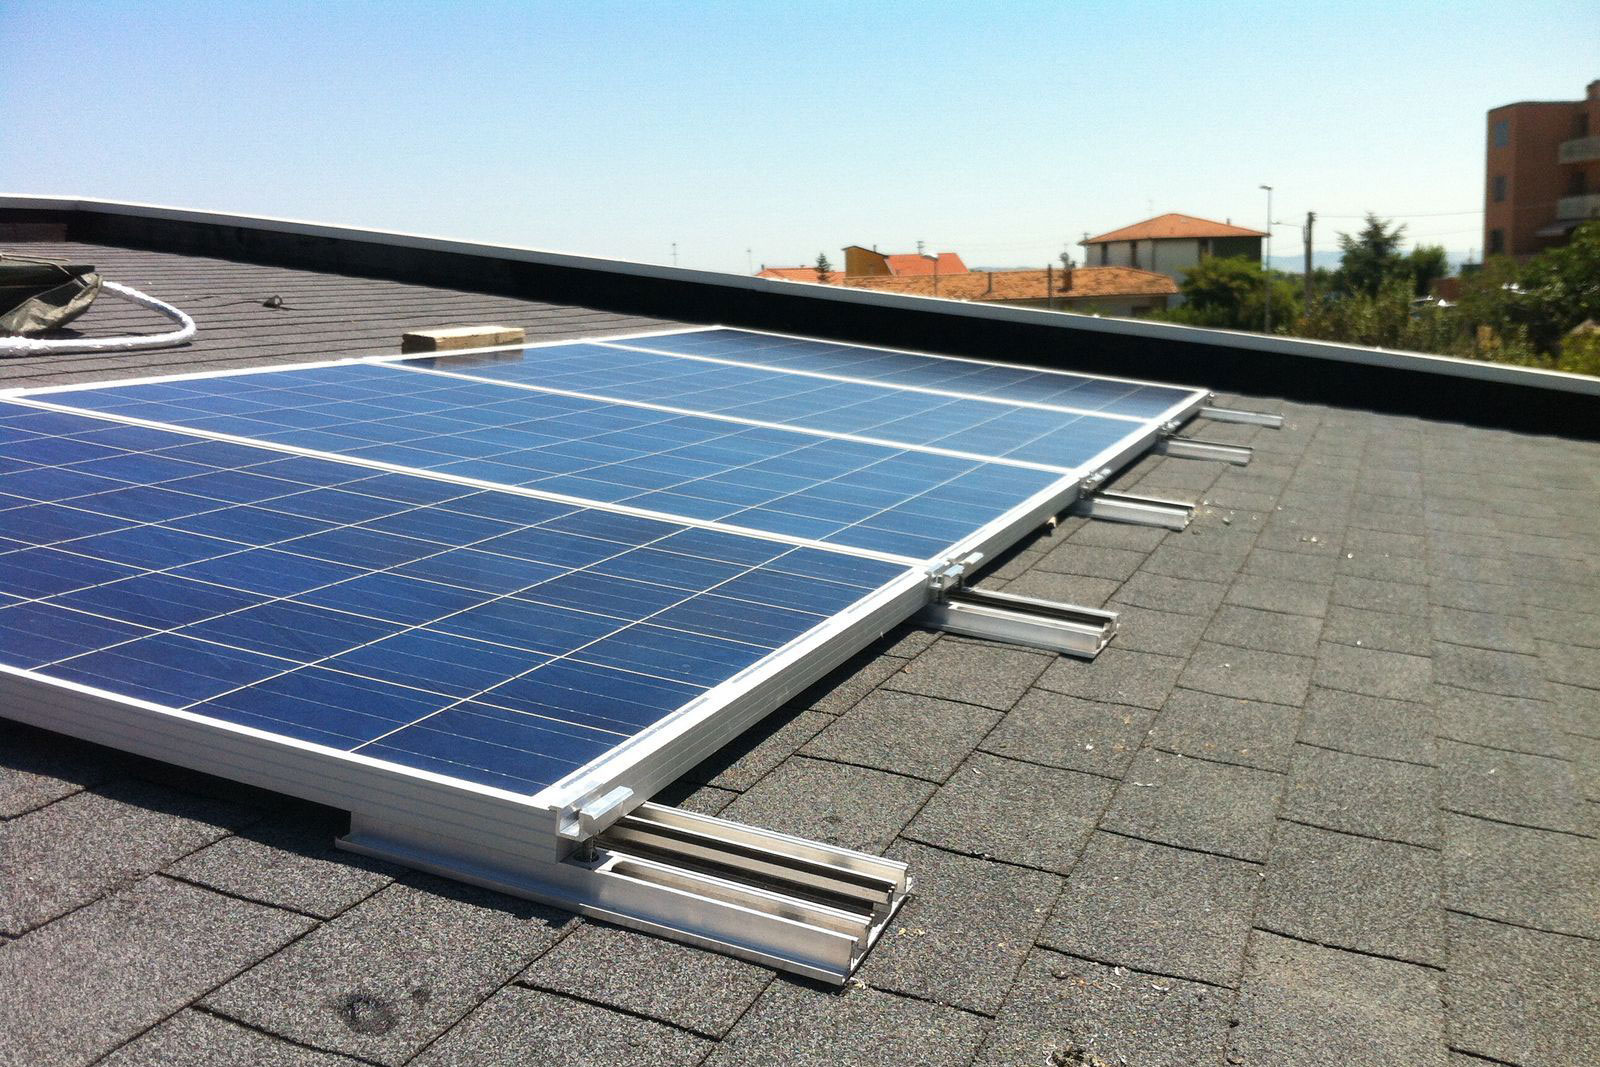 fotovoltaico-montemarciano-ancona-fast-energy